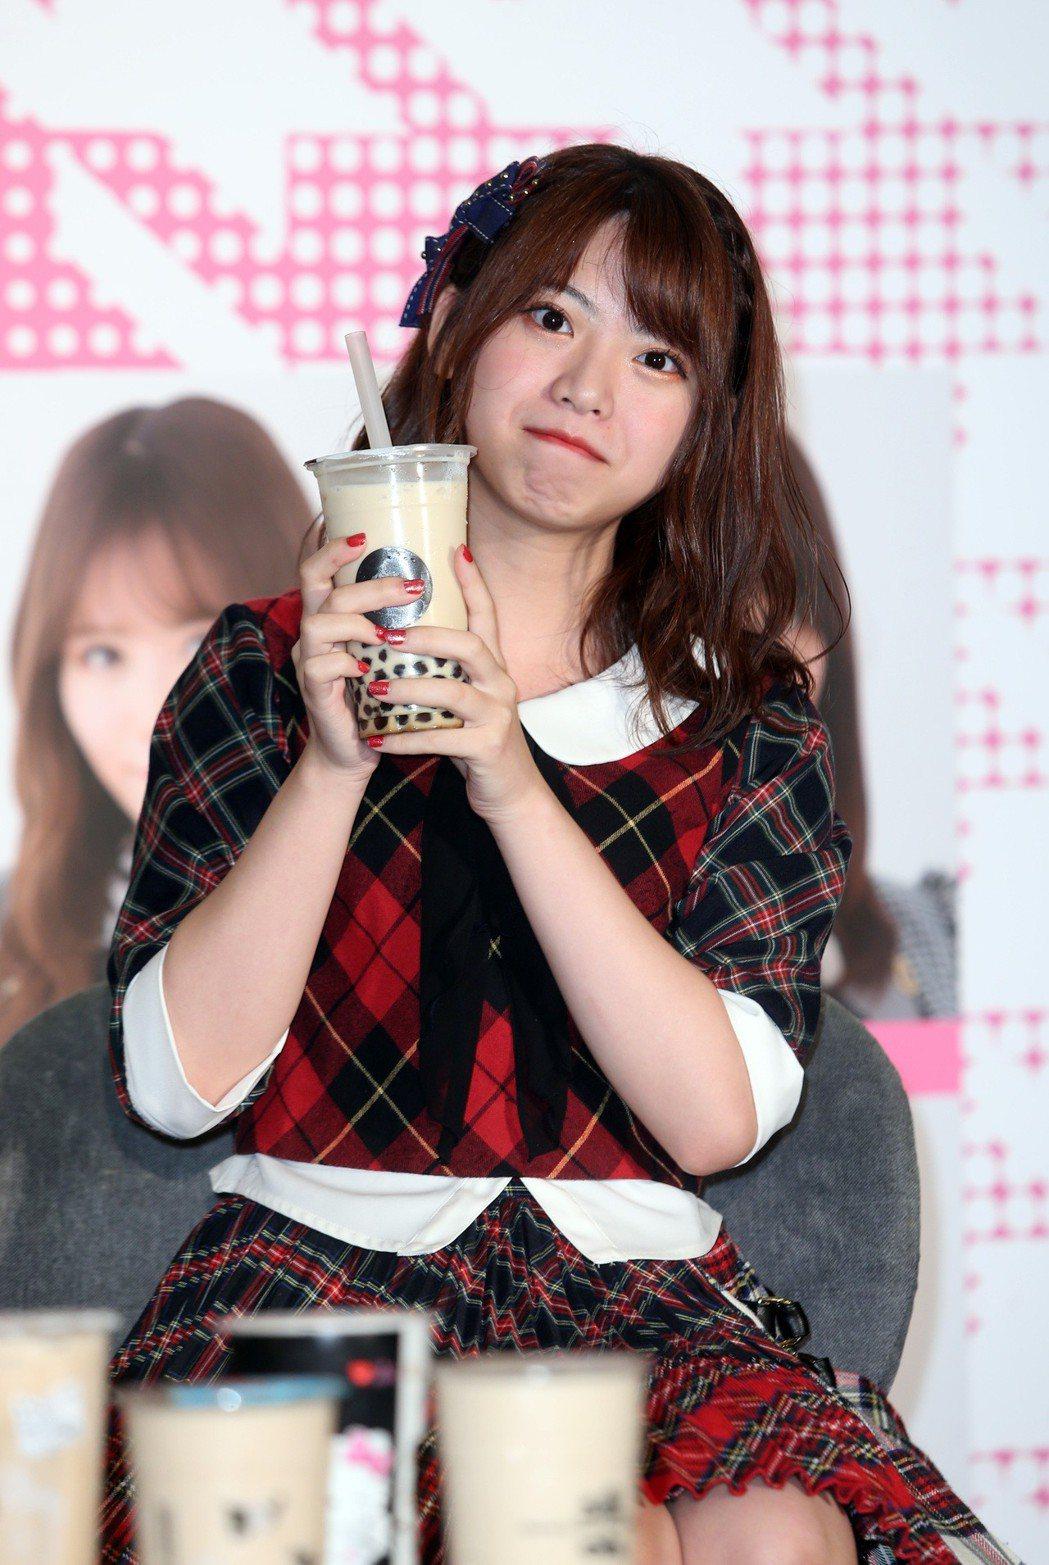 AKB48人氣成員馬嘉伶記者會,宣傳10月小巨蛋演唱會。記者曾吉松/攝影